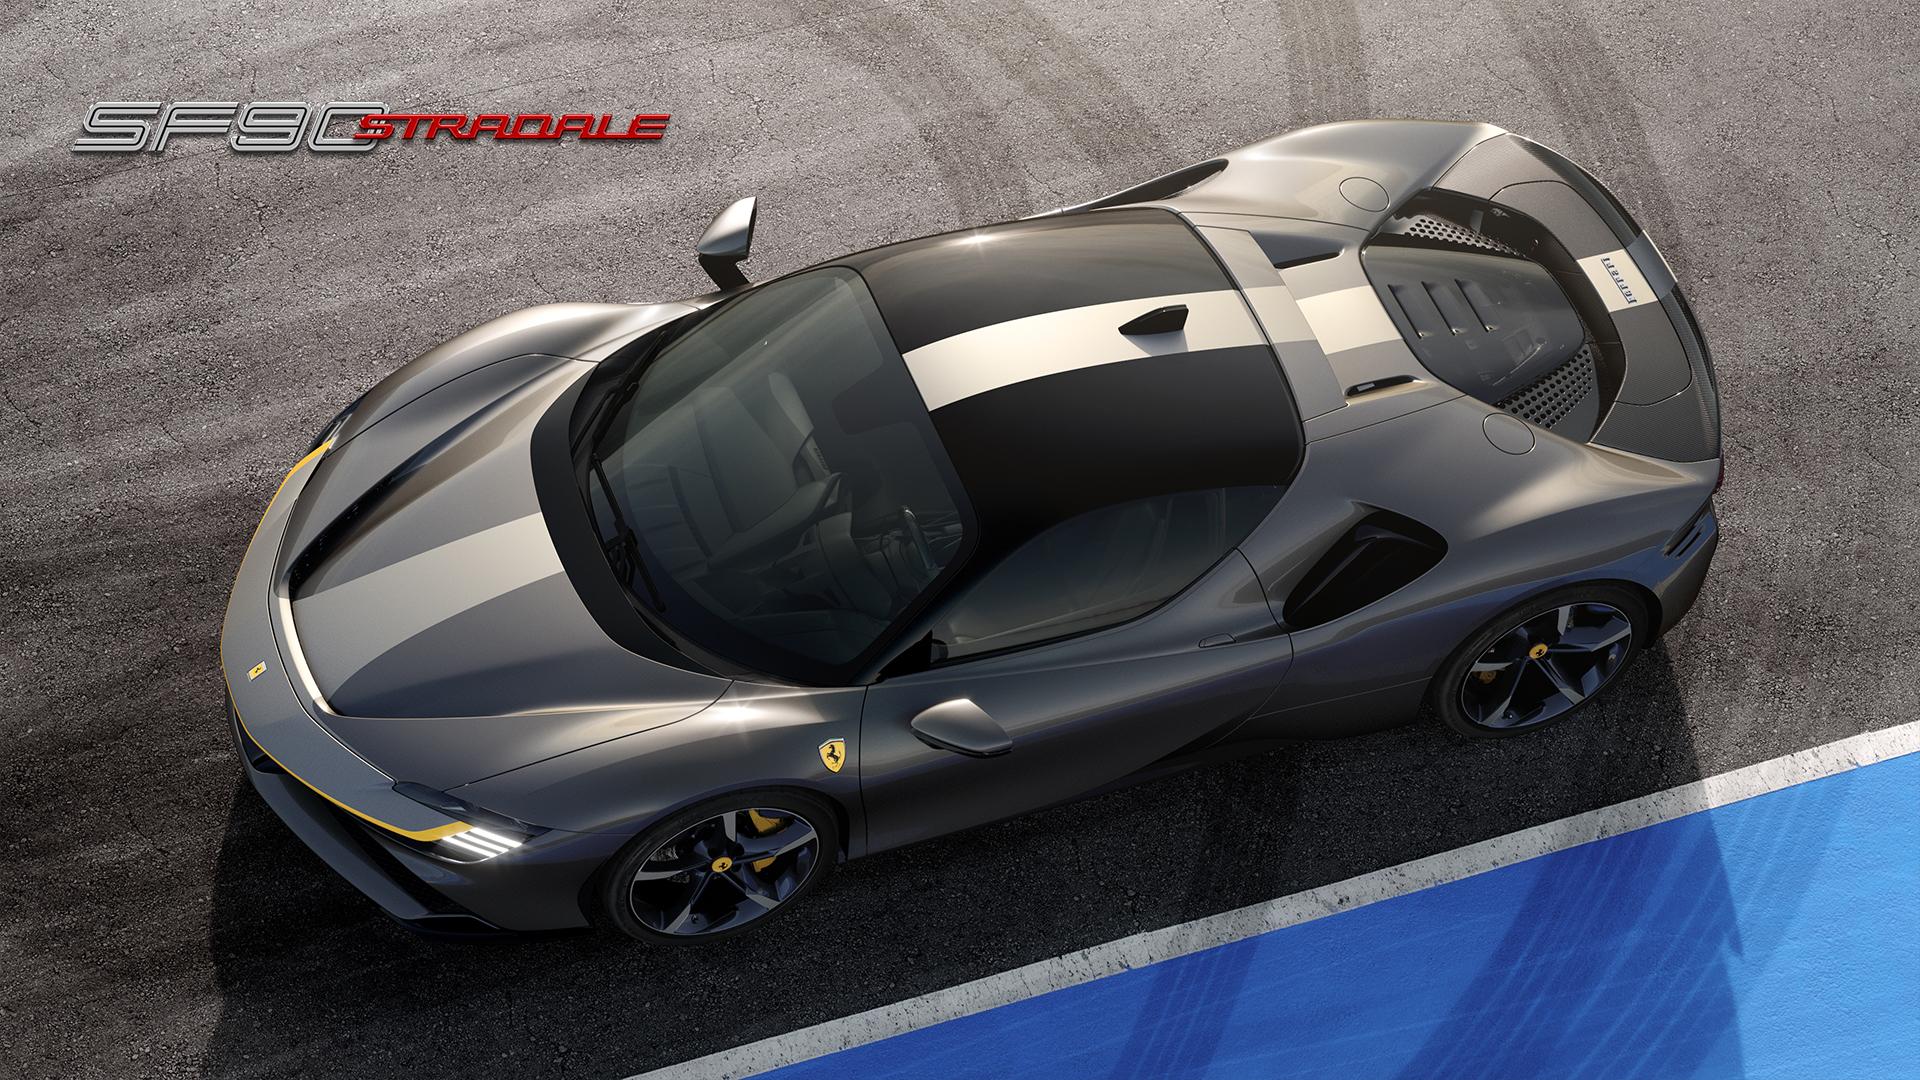 grey Ferrari SF90 Stradale